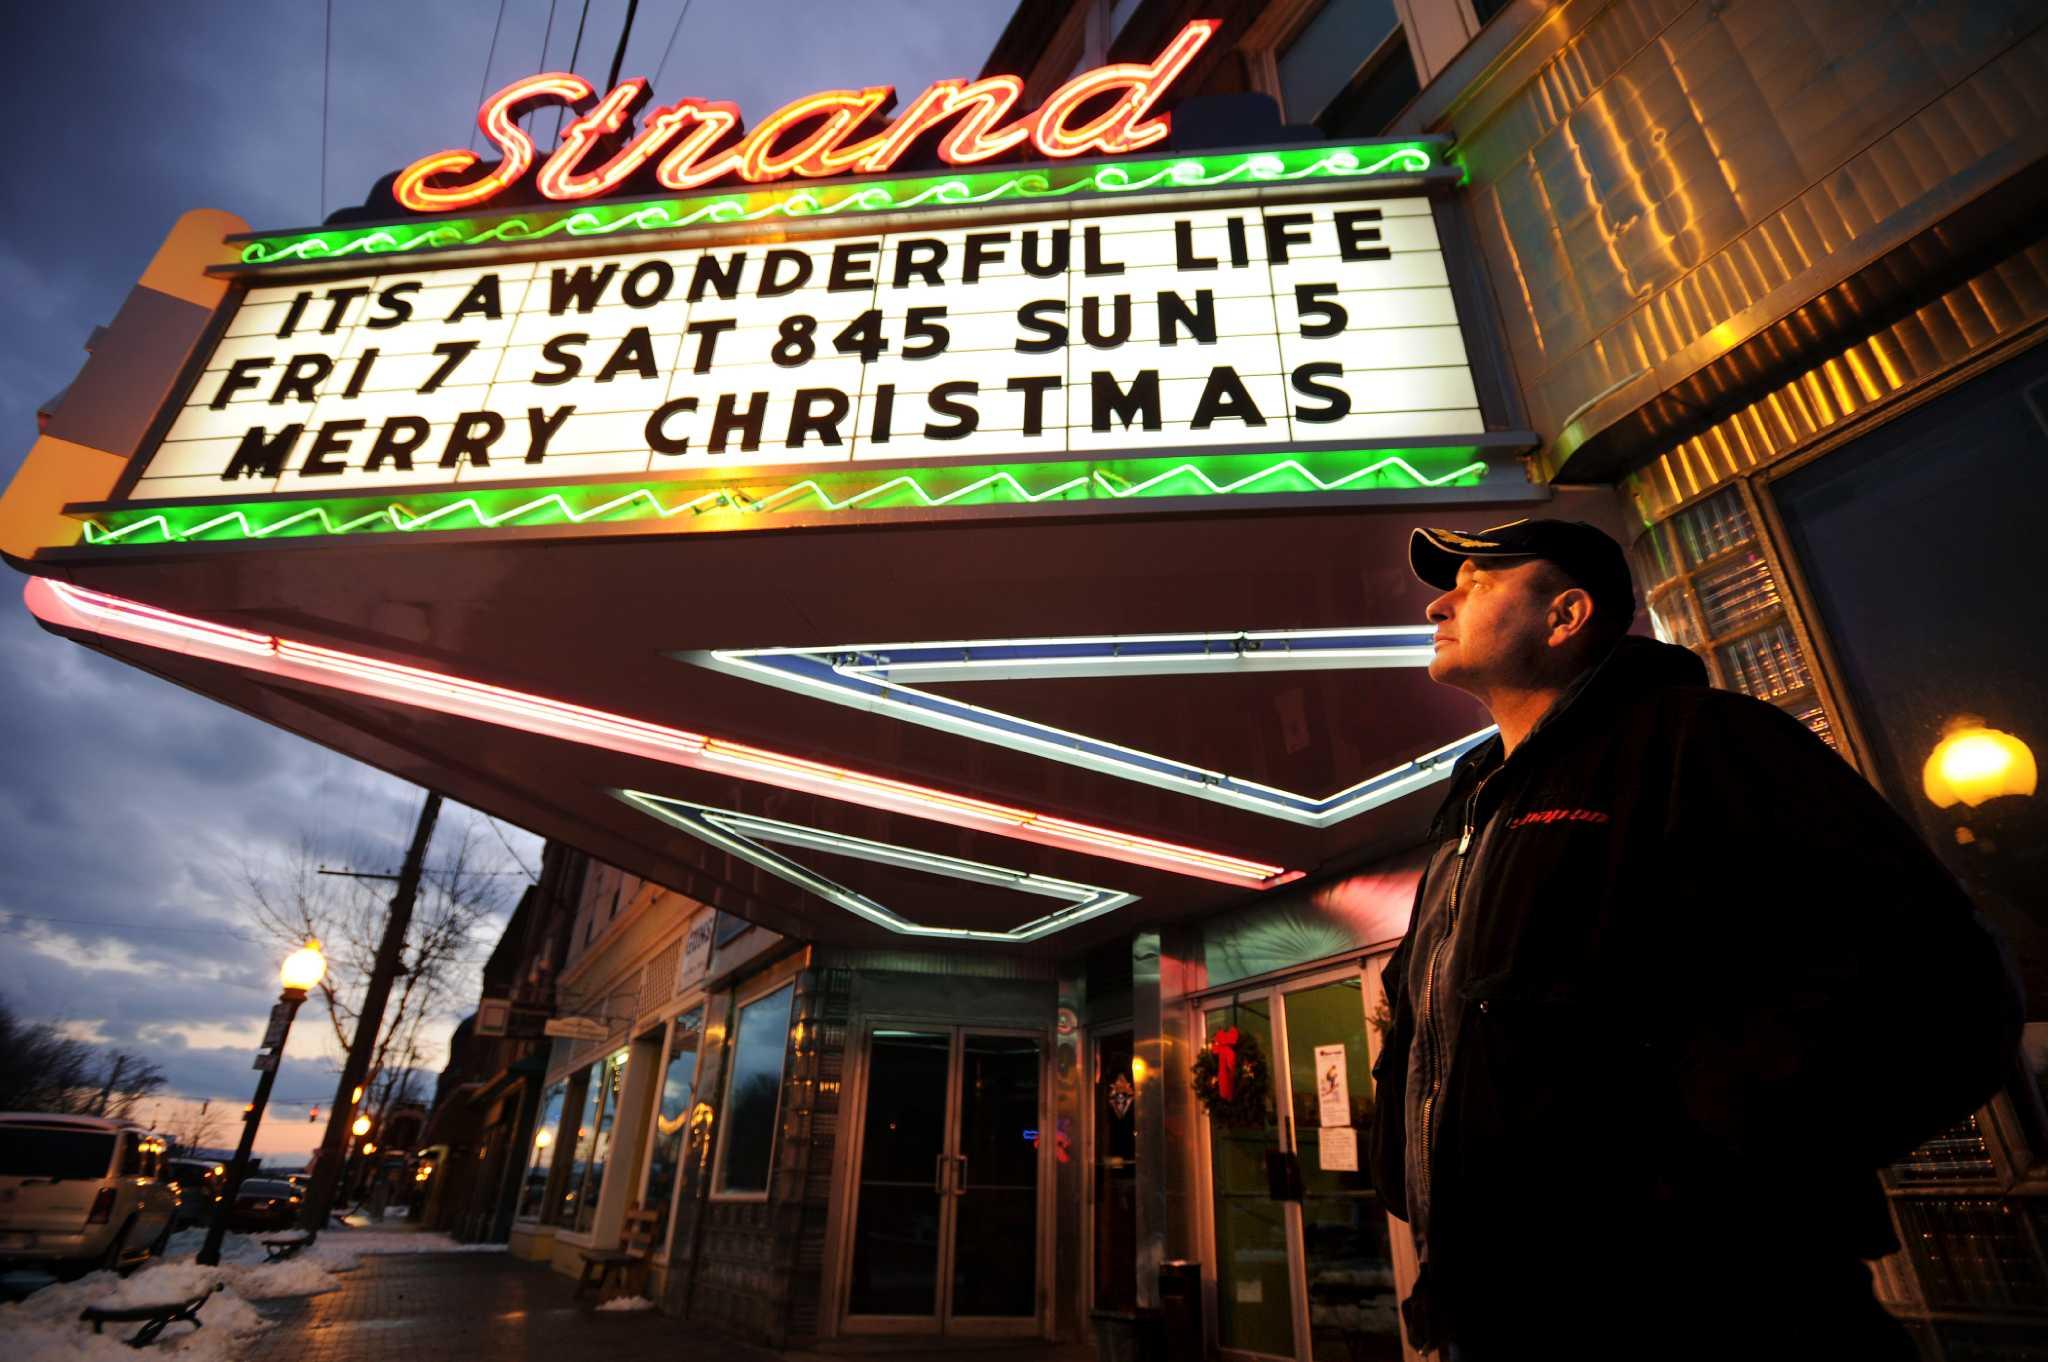 strand theater facing uncertain future stamfordadvocate